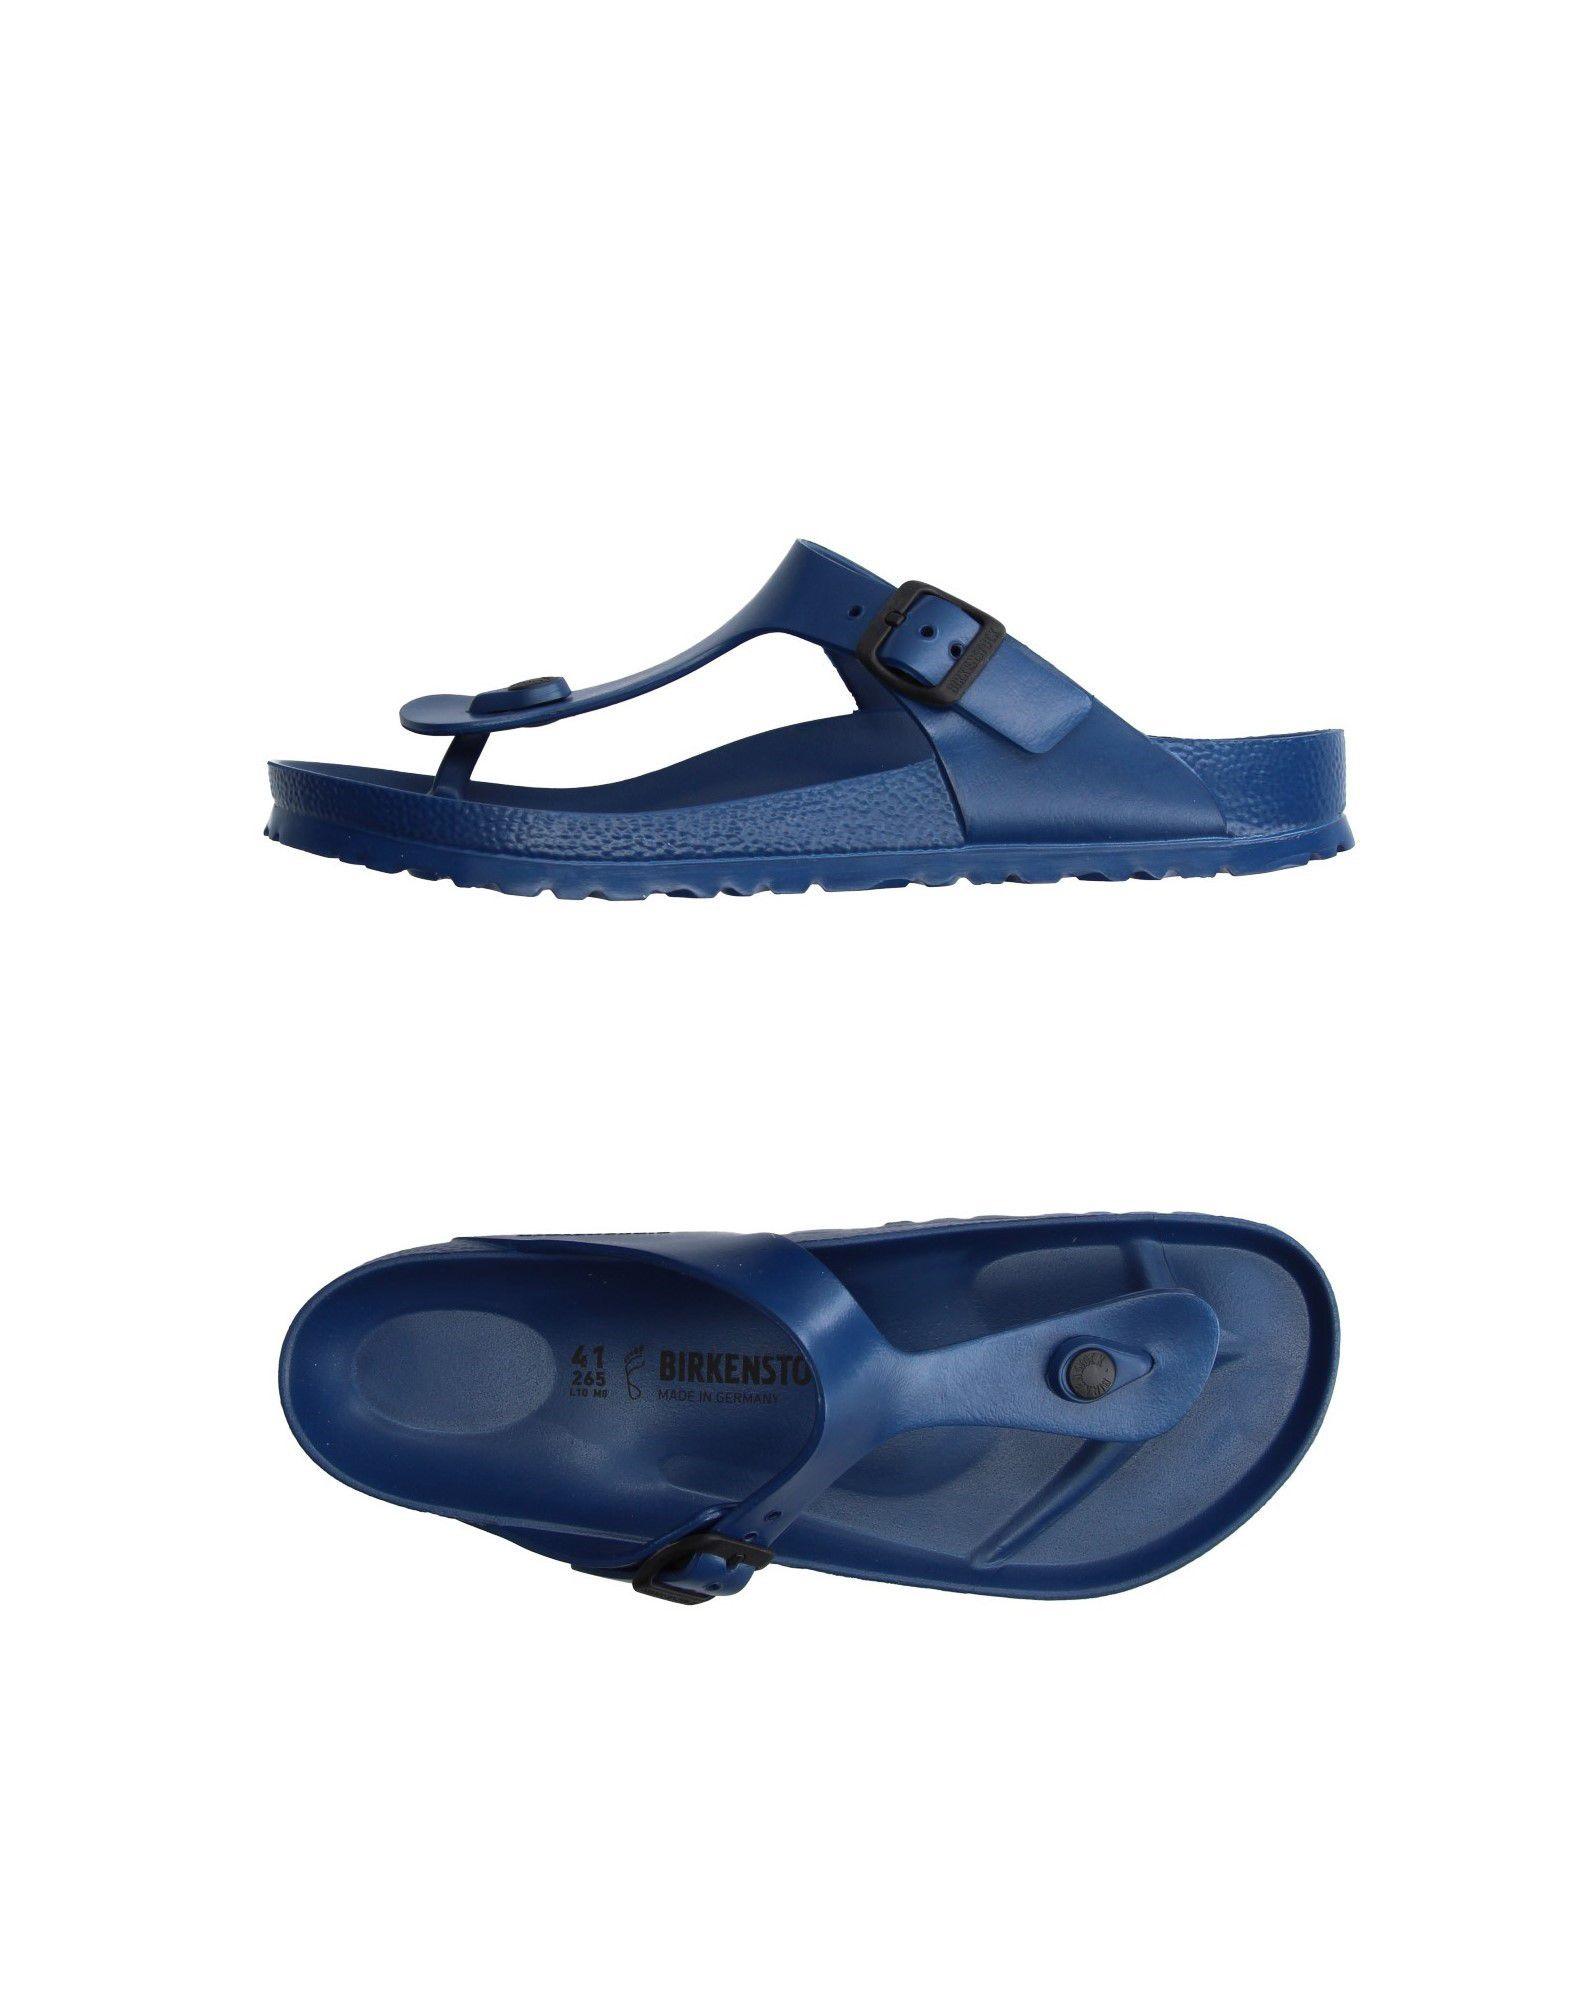 BIRKENSTOCK Вьетнамки обувь для дома birkenstock mg betula